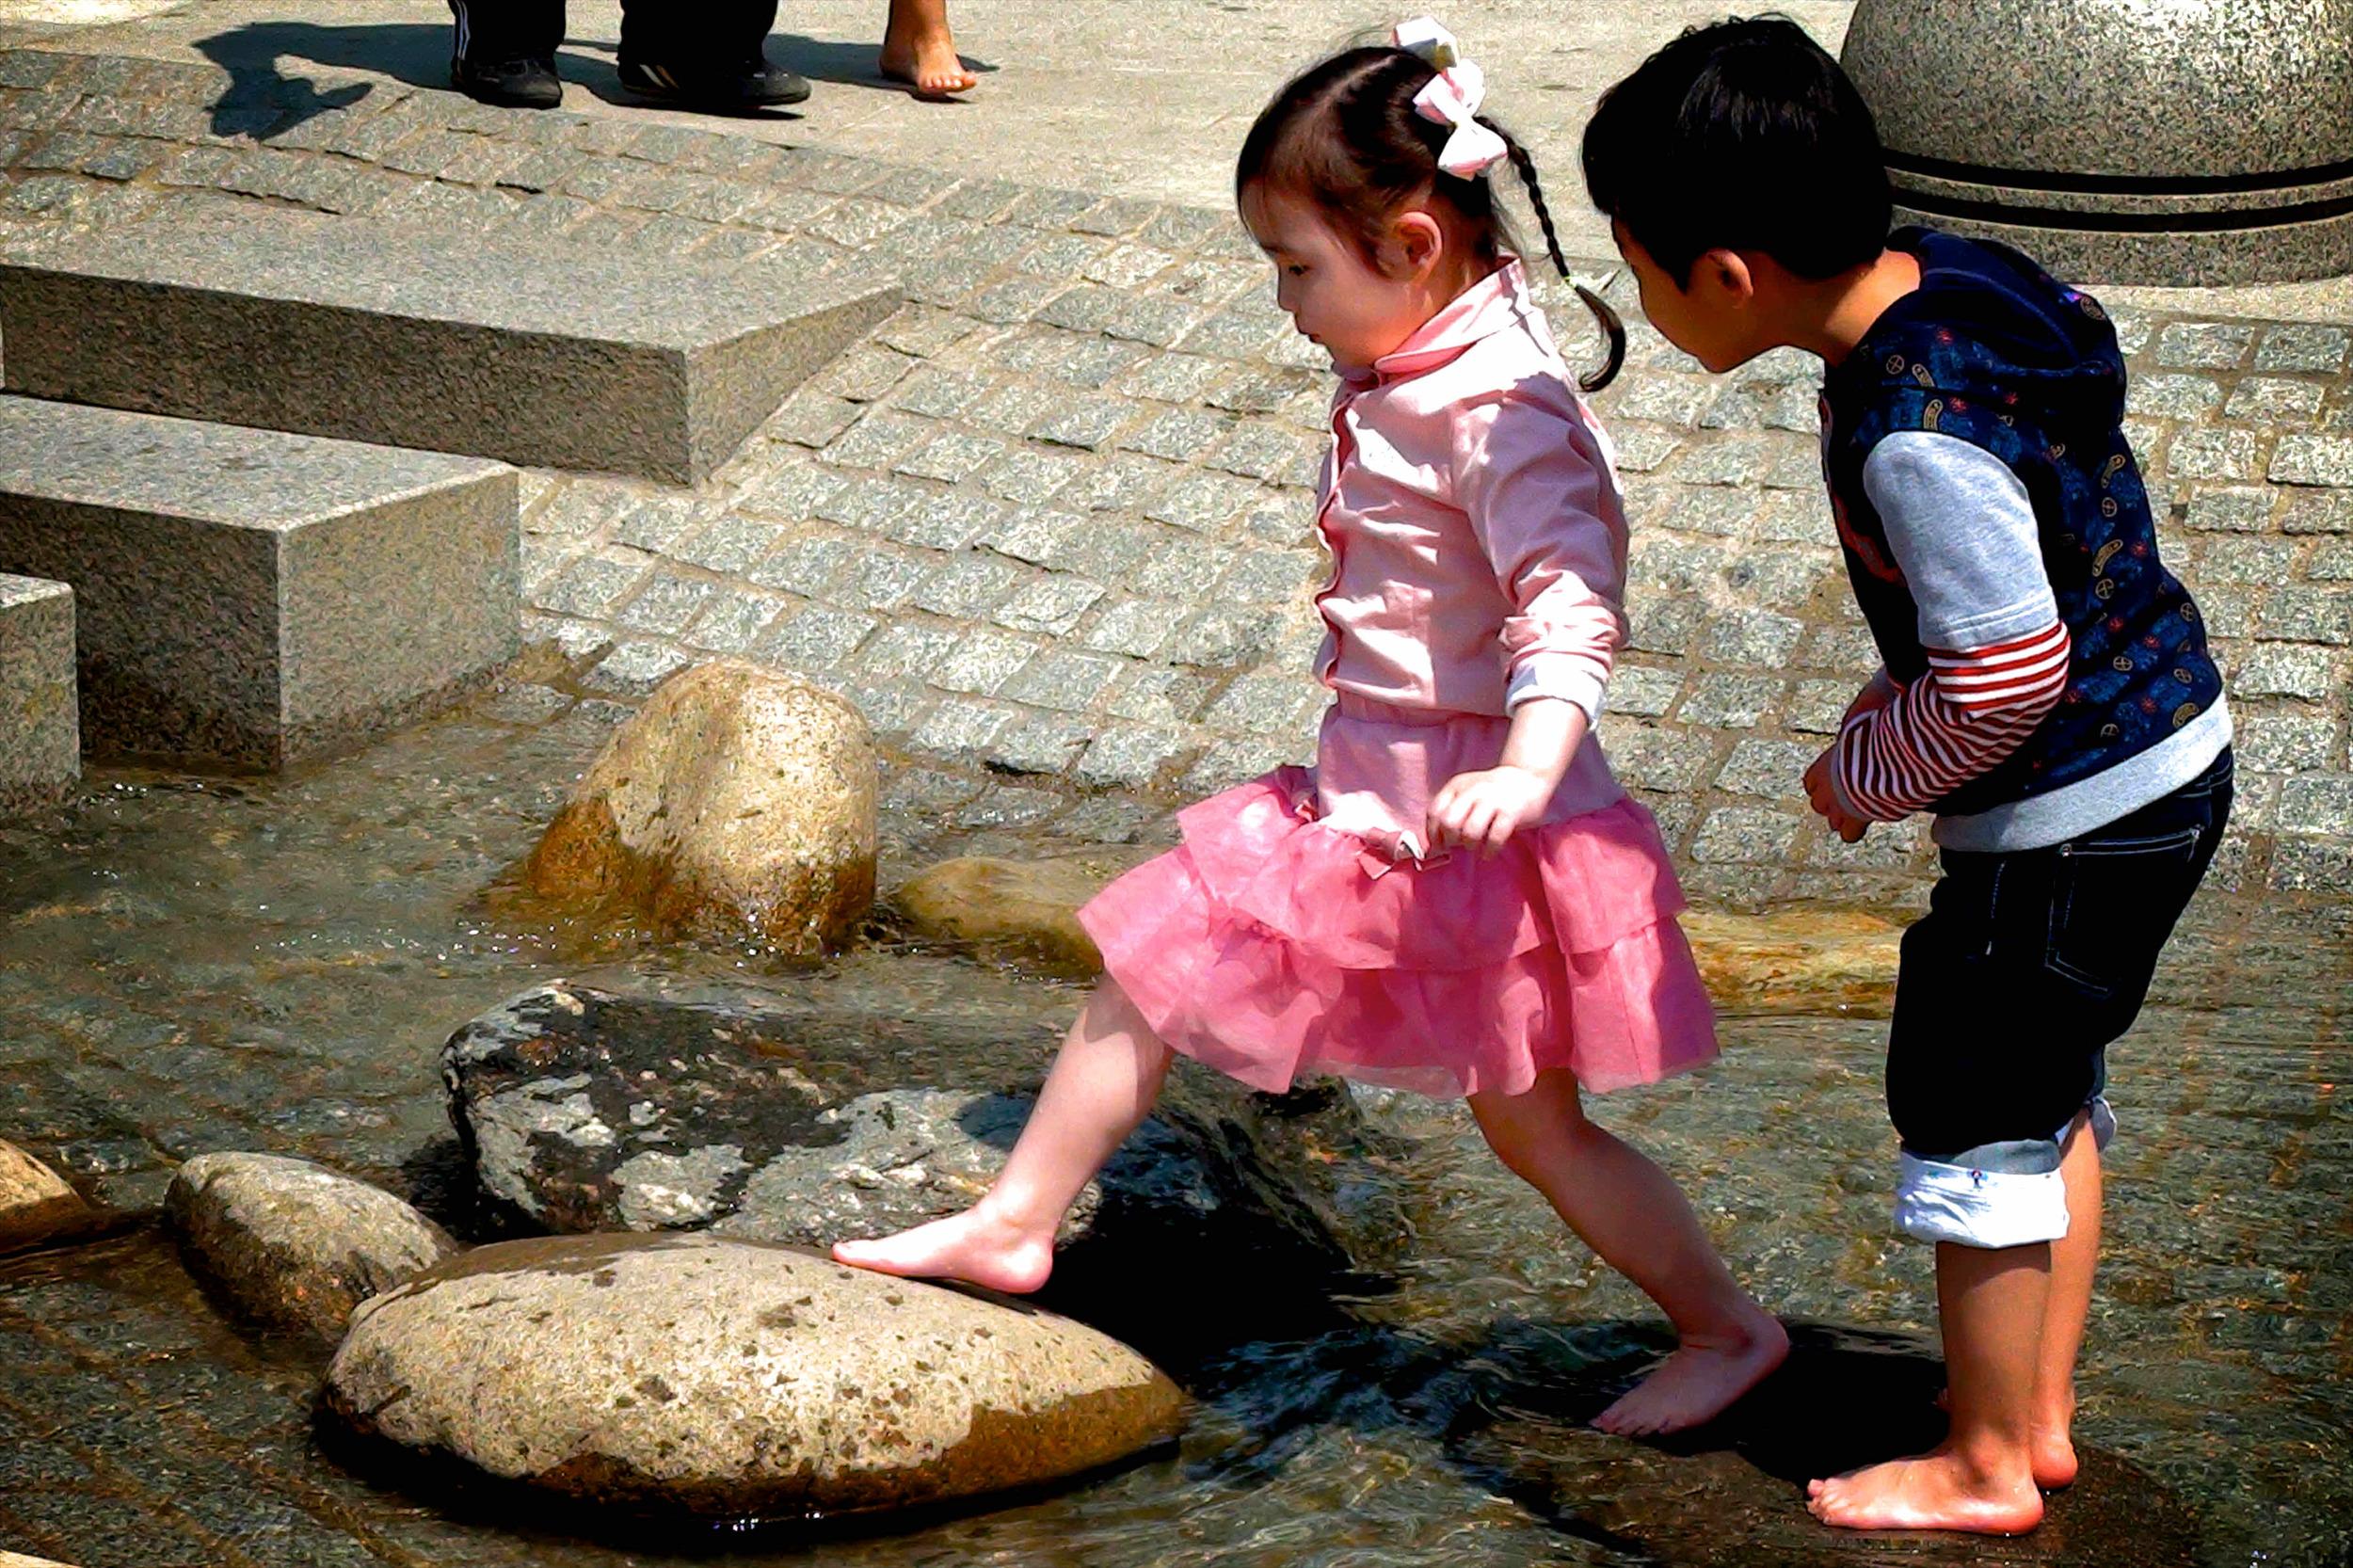 Korean offsprings